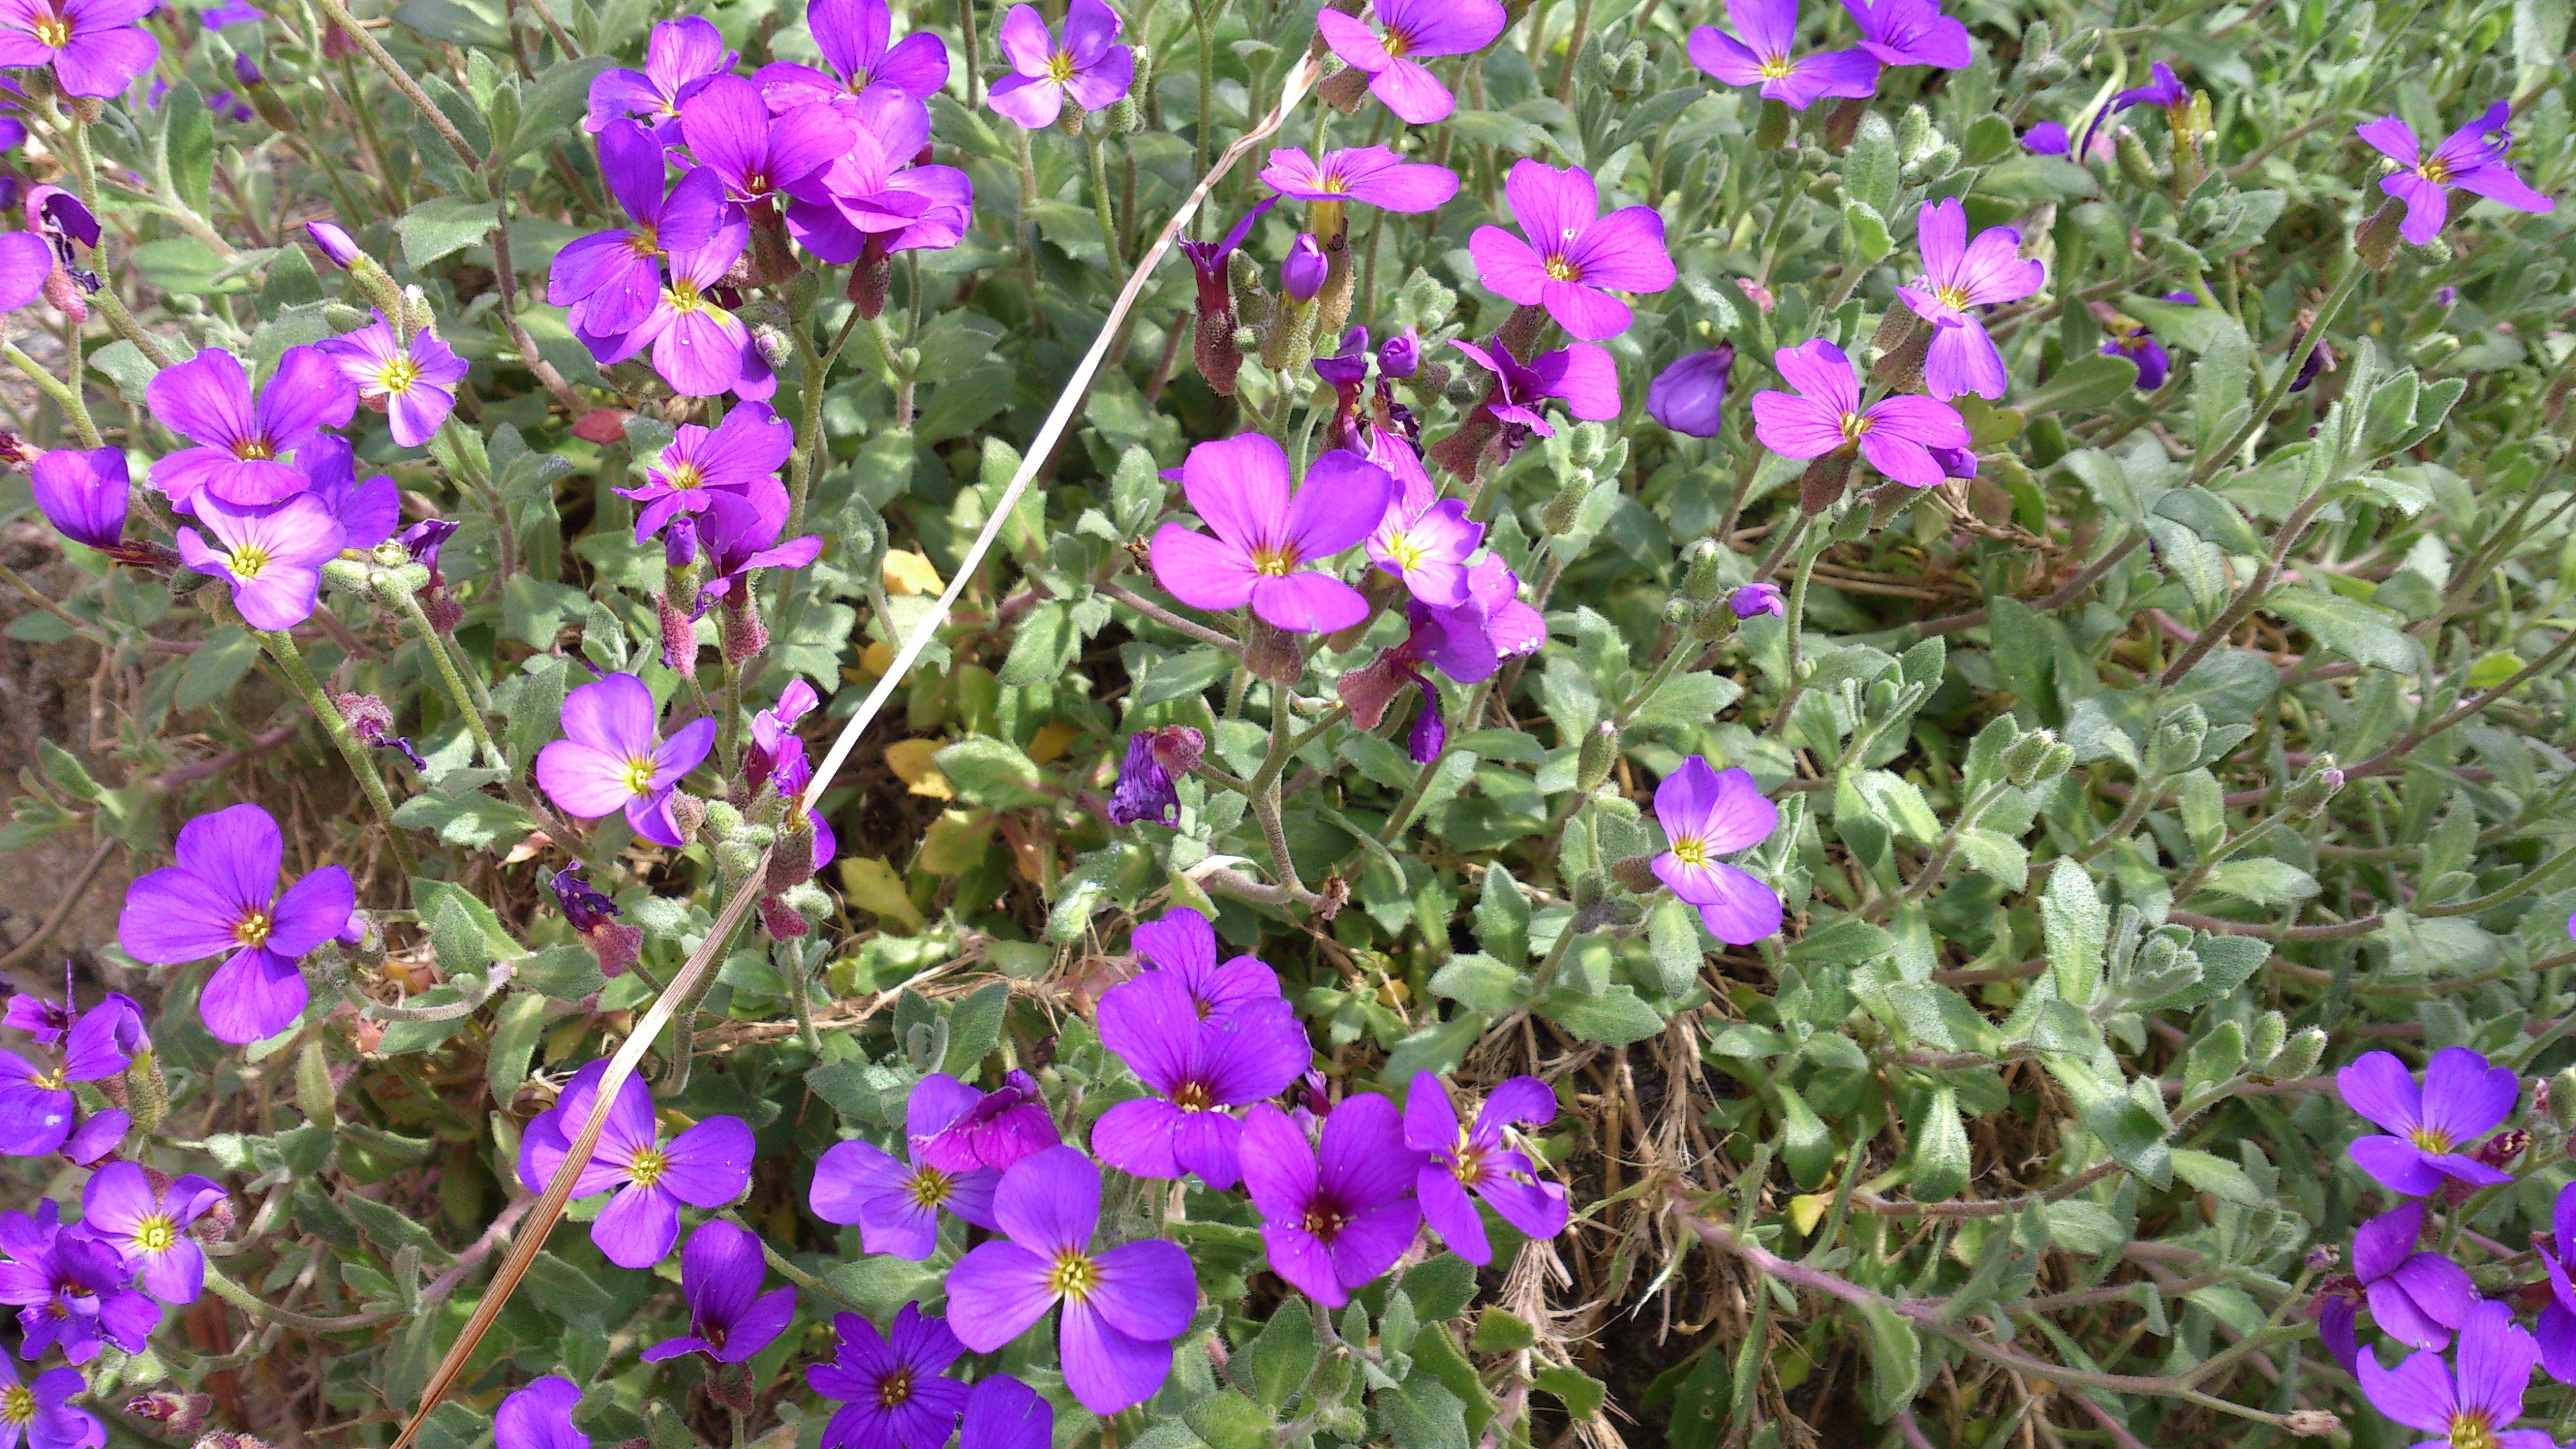 Pin Purple flowering bush pictures on Pinterest